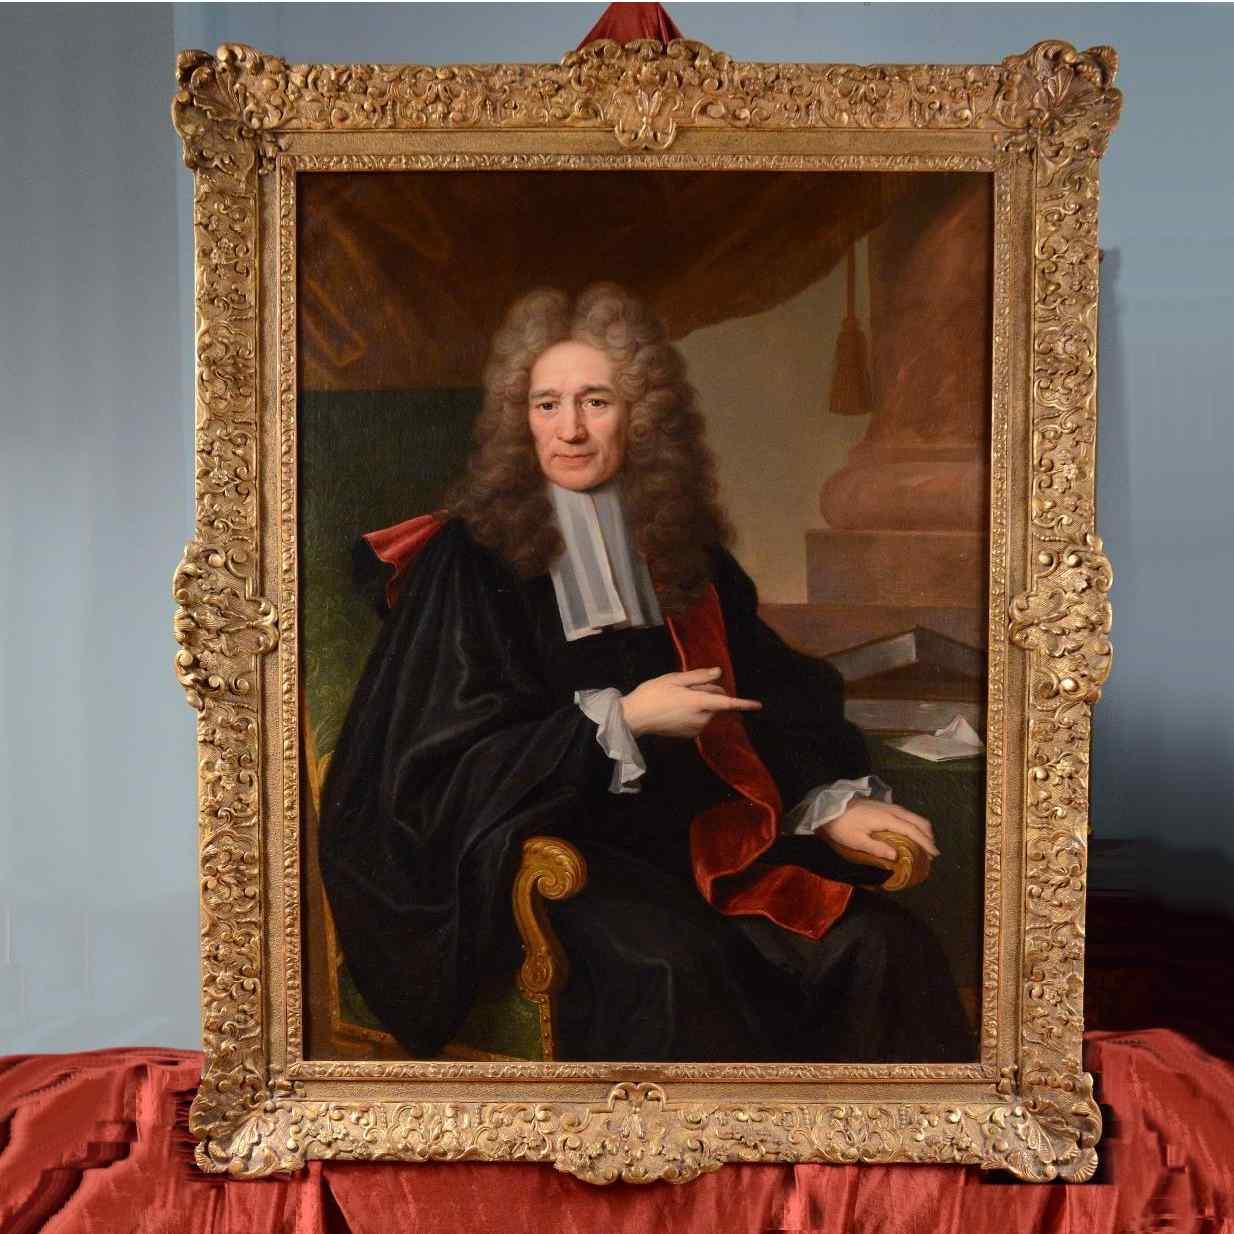 Grand portrait de magistrat, Atelier di Hyacinthe RIGAUD